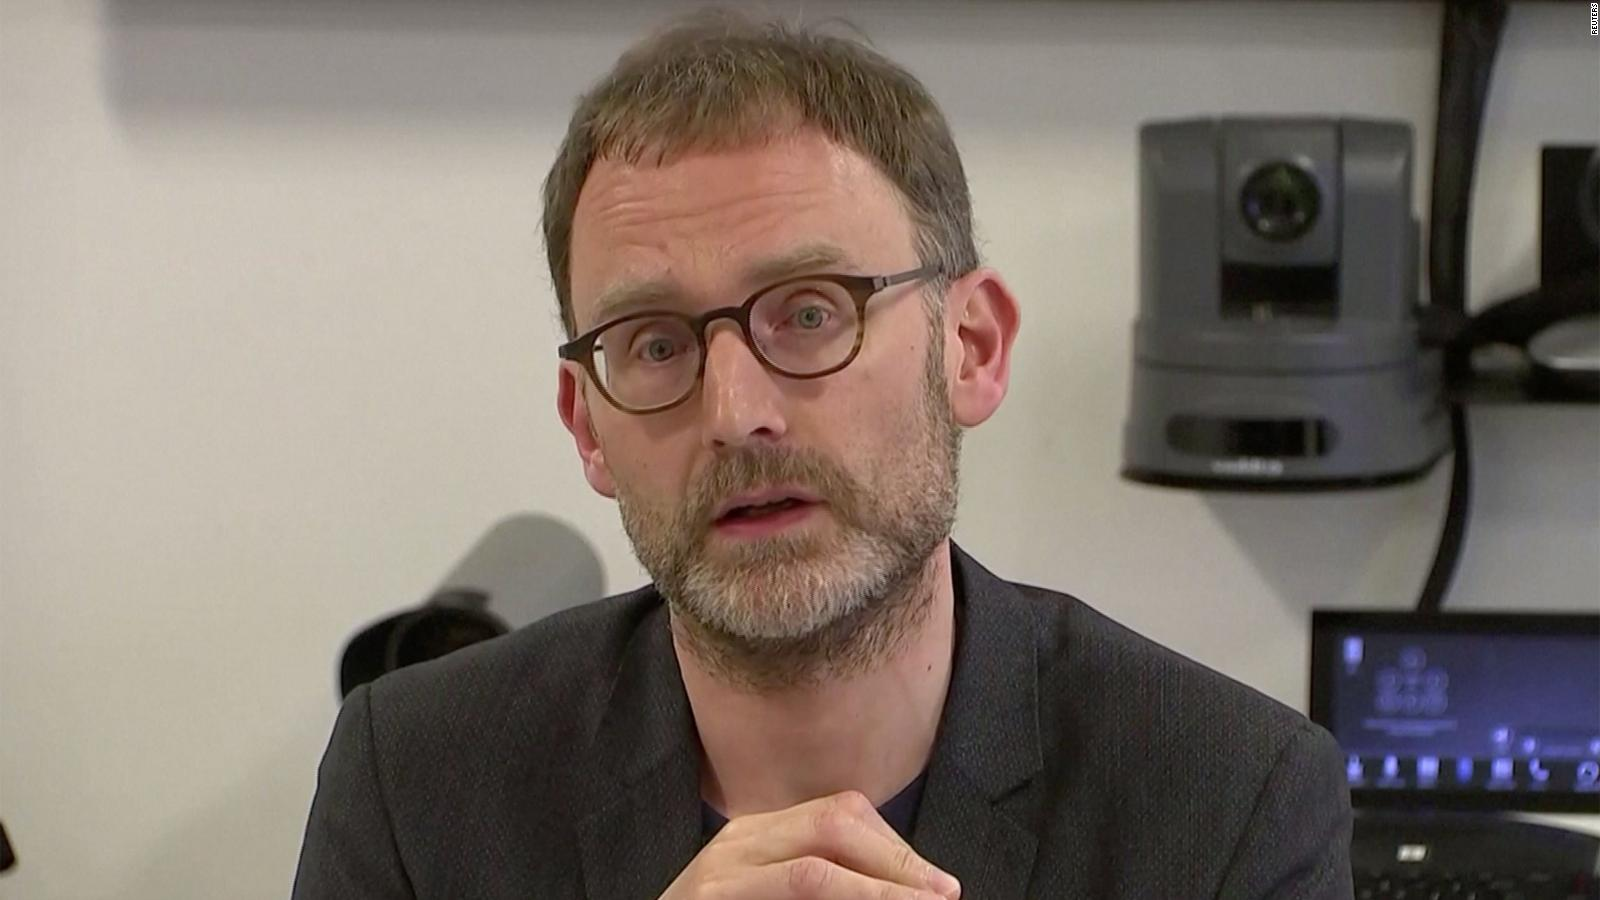 Professor Neil Ferguson speaks at a news conference in London, England, on January 22.